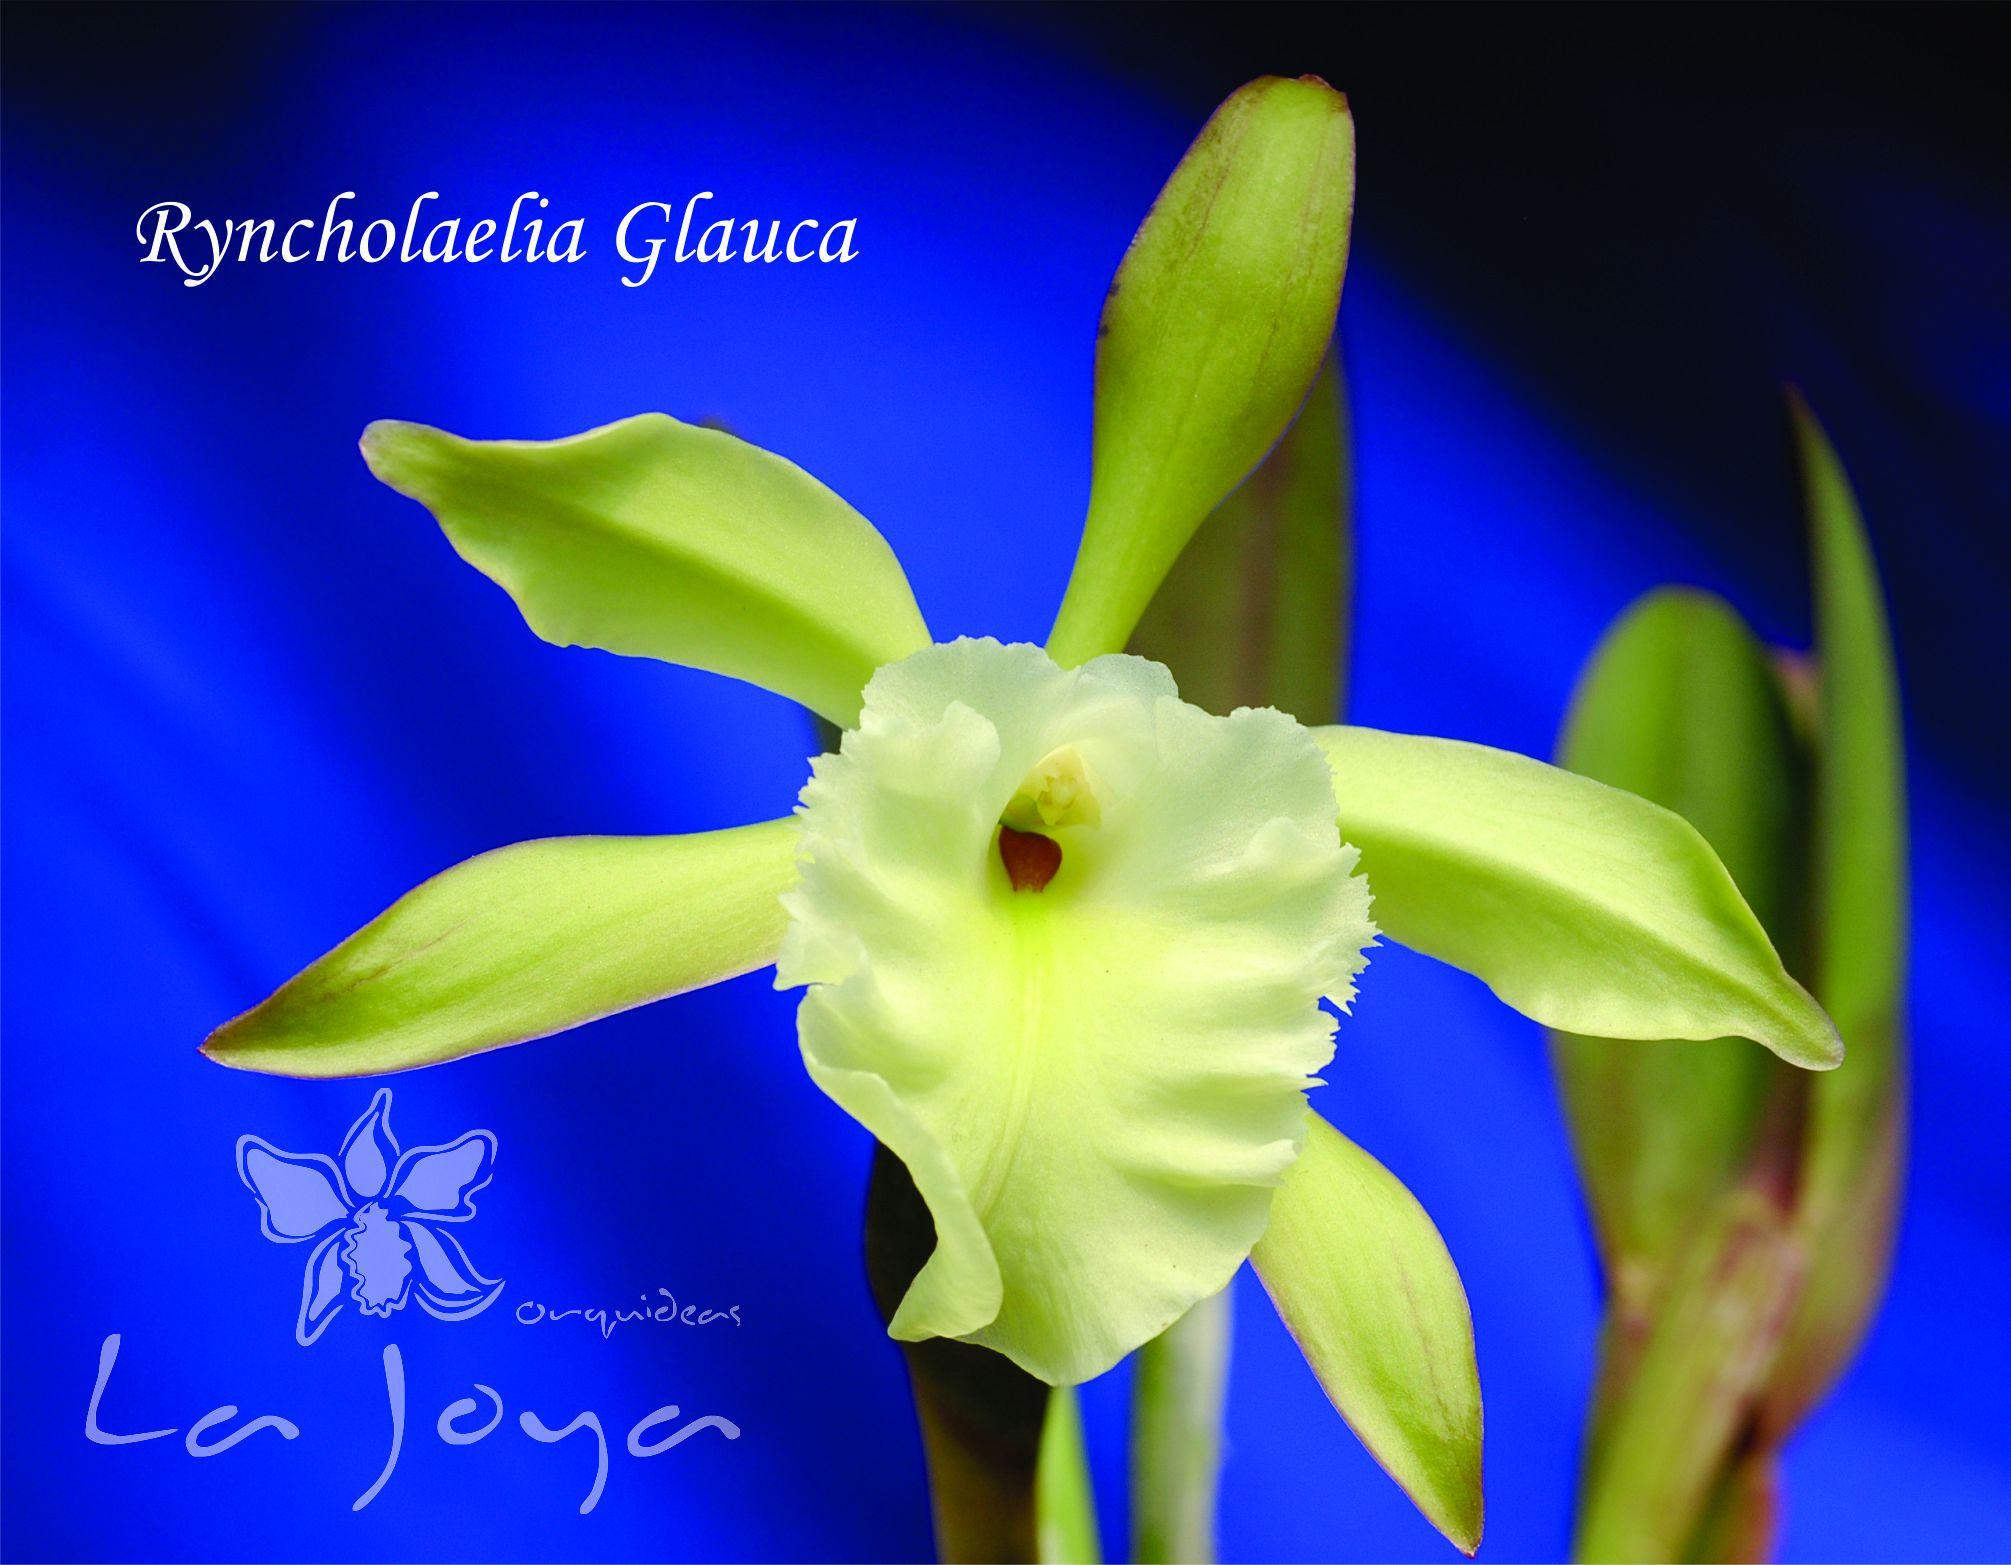 Ryncholaelia Glauca